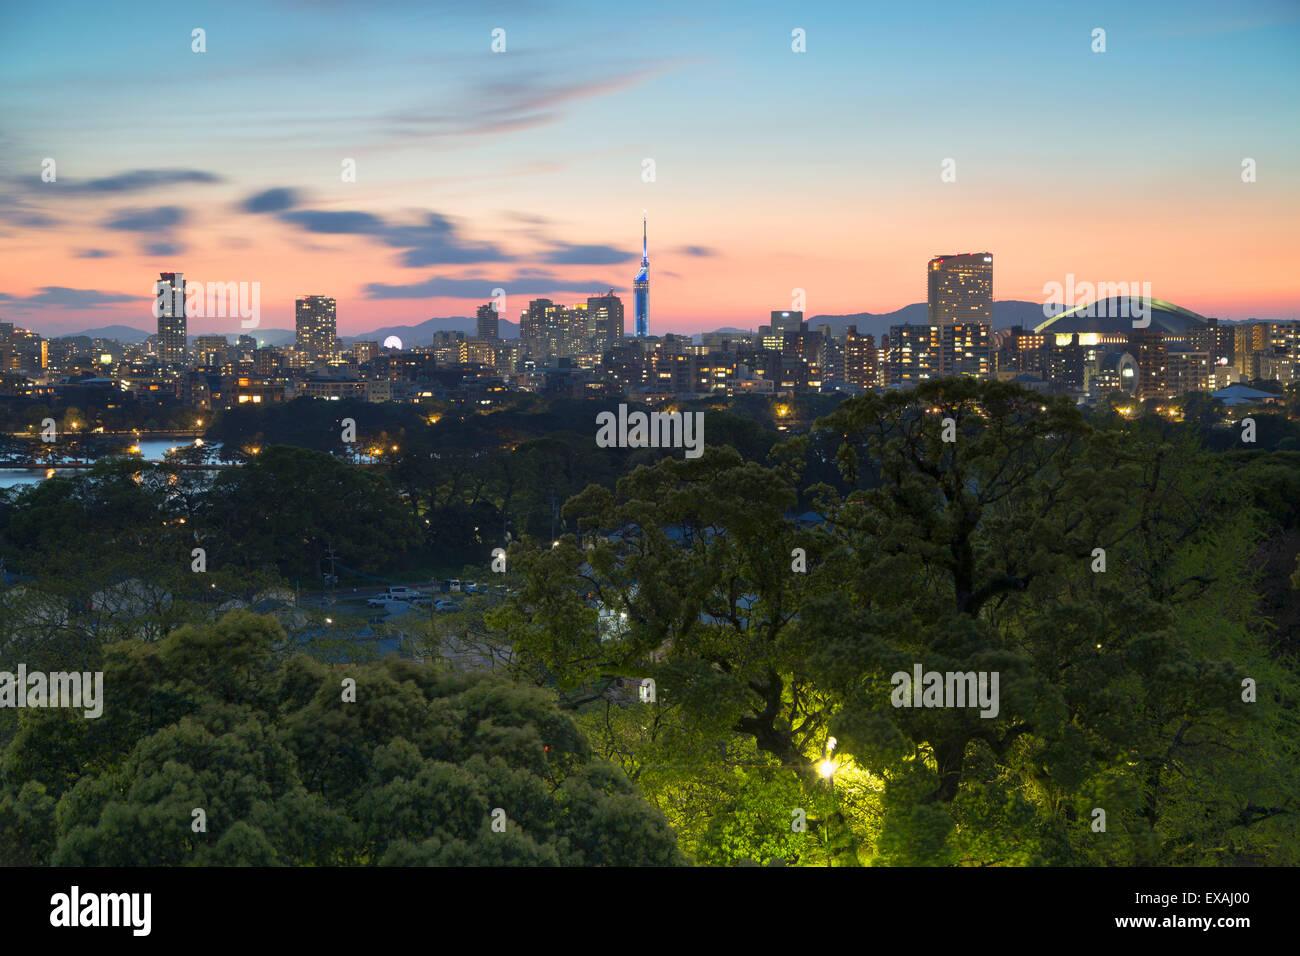 Coastal area skyline at sunset, Fukuoka, Kyushu, Japan, Asia Stock Photo